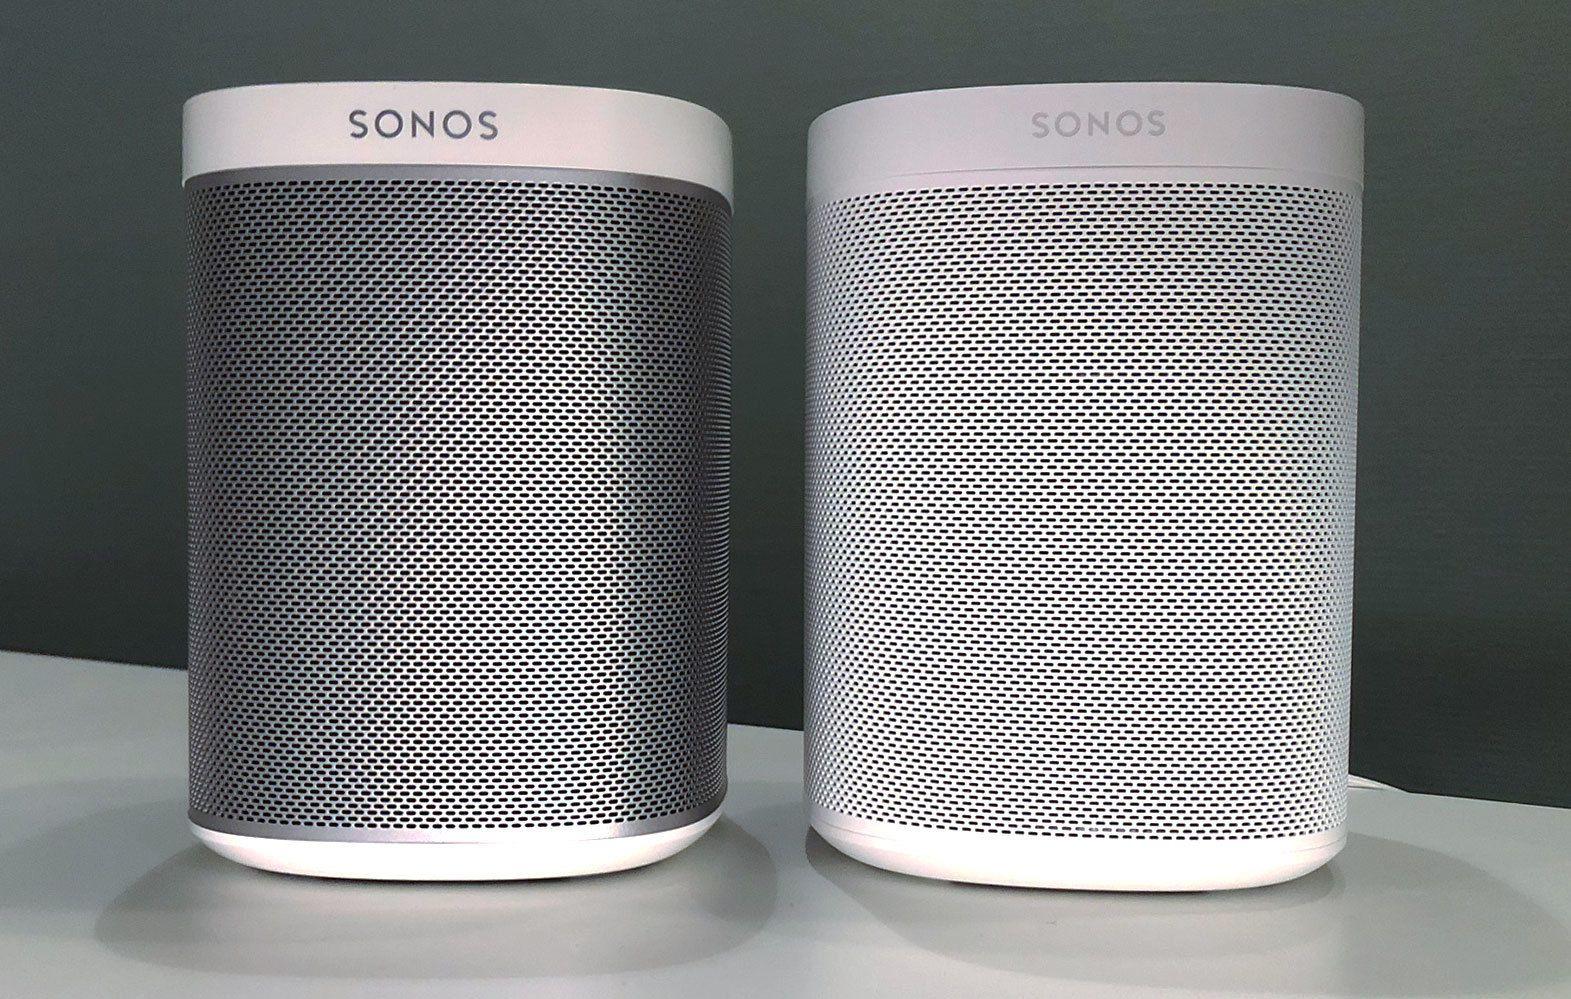 Sonos One kommer enten i helsvart eller i helhvitt, mens Sonos Play:1 til venstre alltid har en metallgrå midtpart.